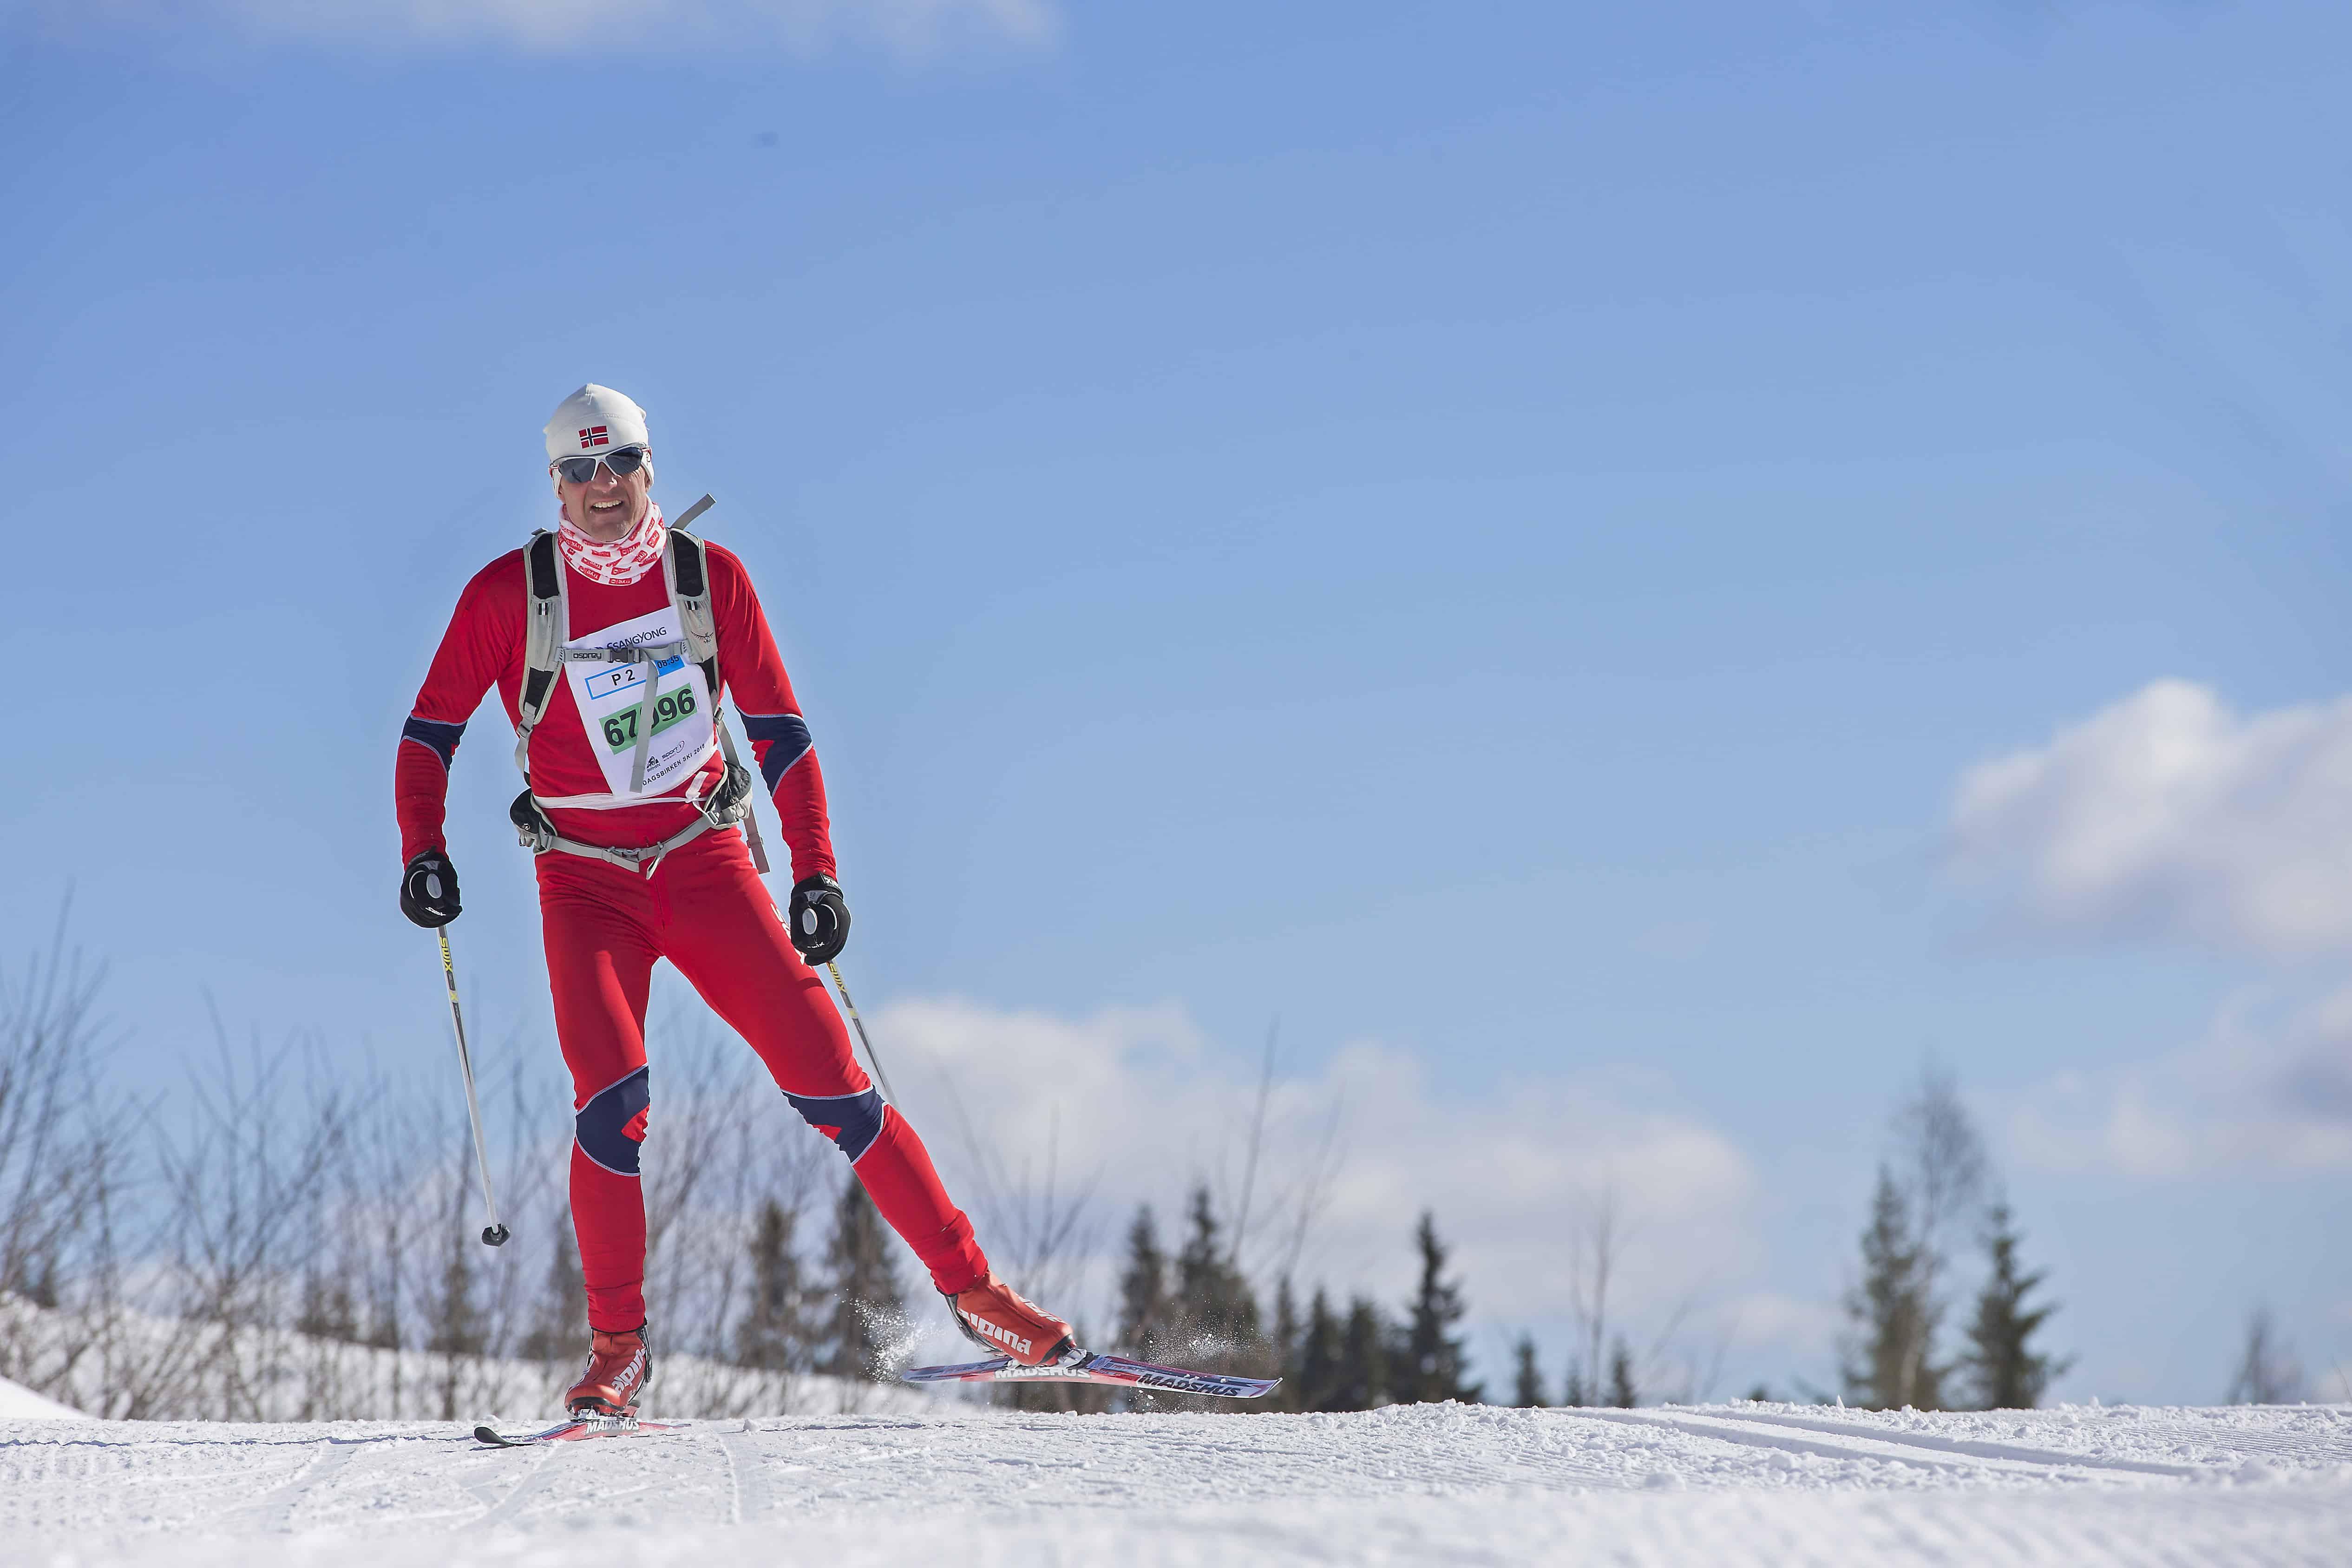 FredagsBirken ski blir SkøyteBirken og TurBirken ski